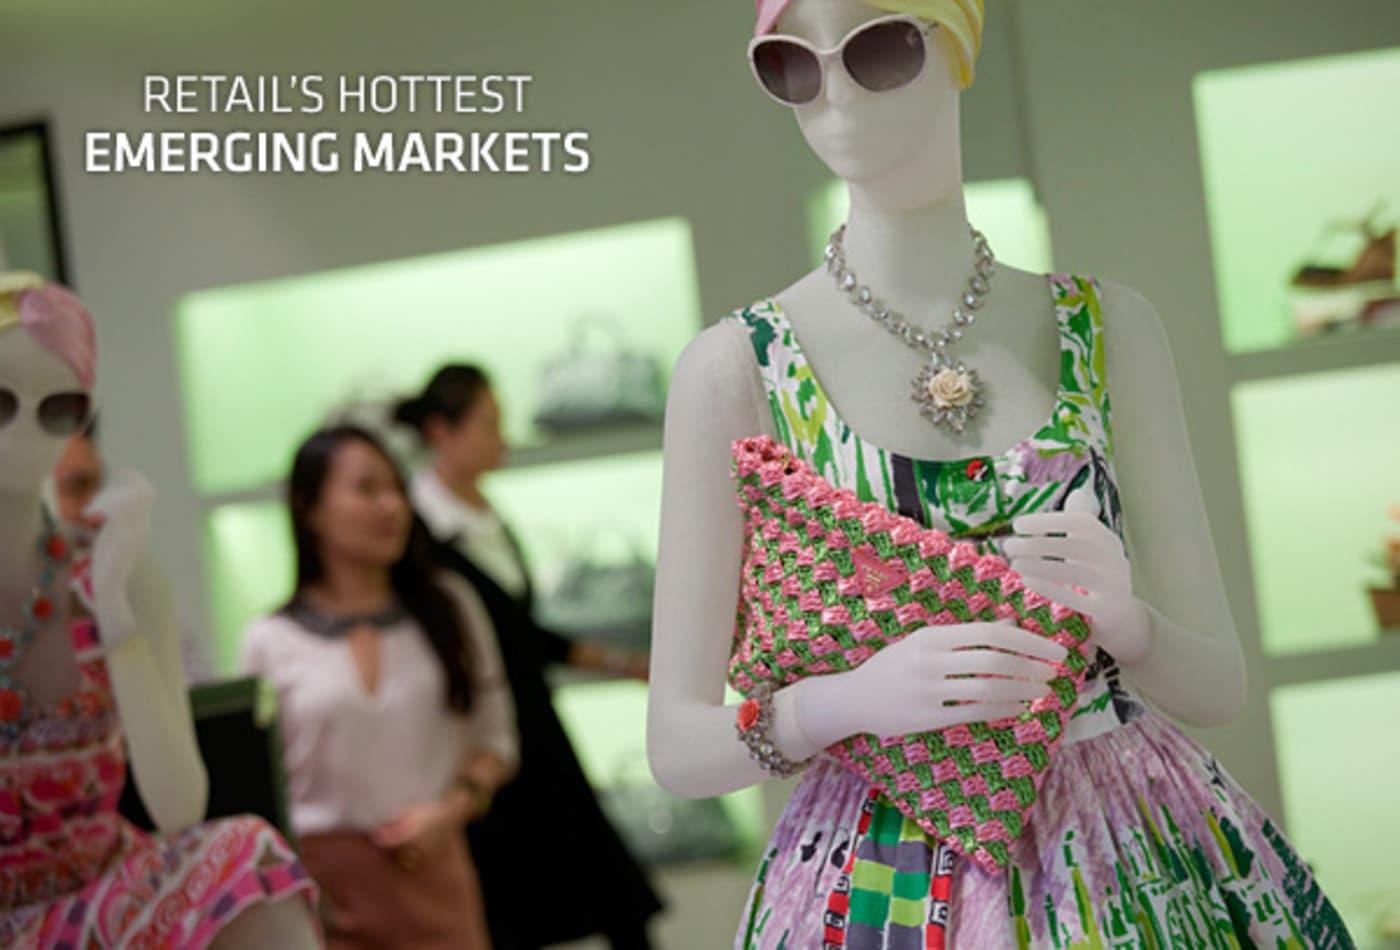 Retails-hottest-emerging-markets-2012-cover.jpg